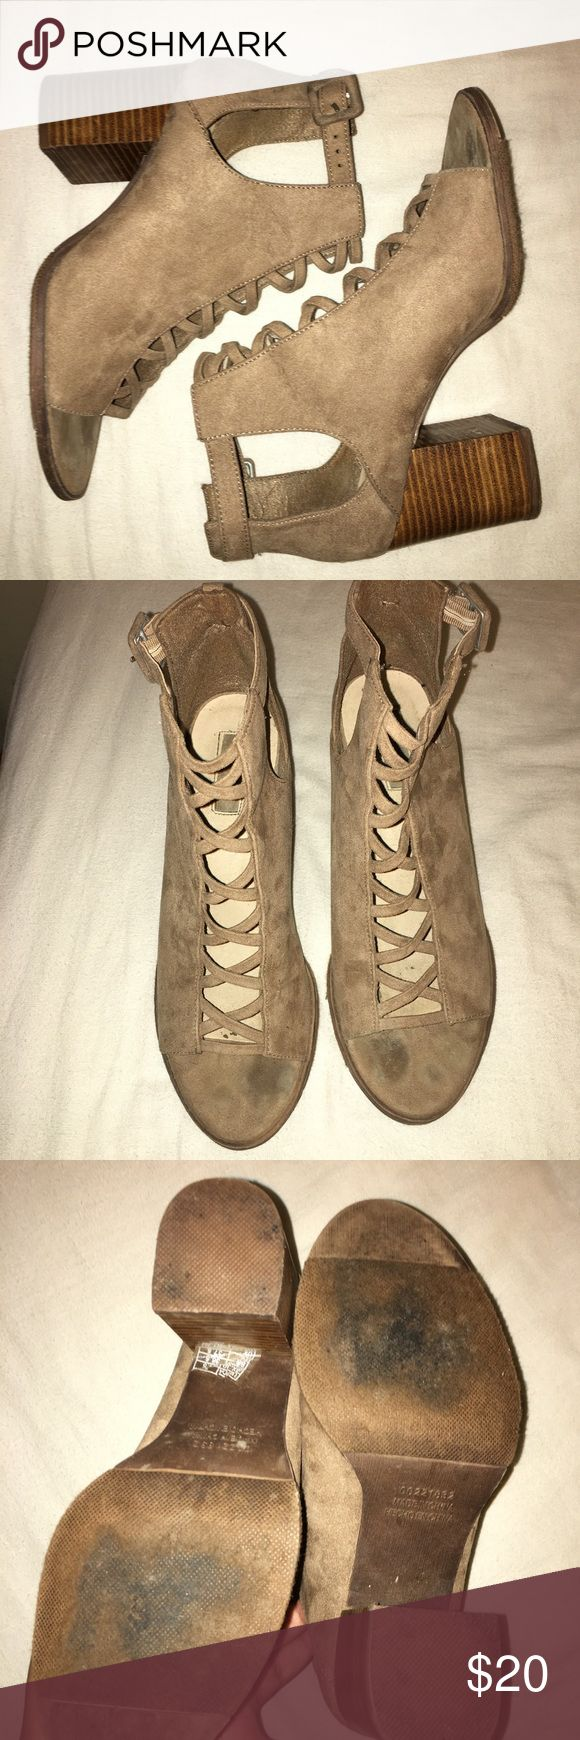 Charlotte Russe Wedges Charlotte Russe tan wedges. Worn once. Charlotte Russe Shoes Wedges